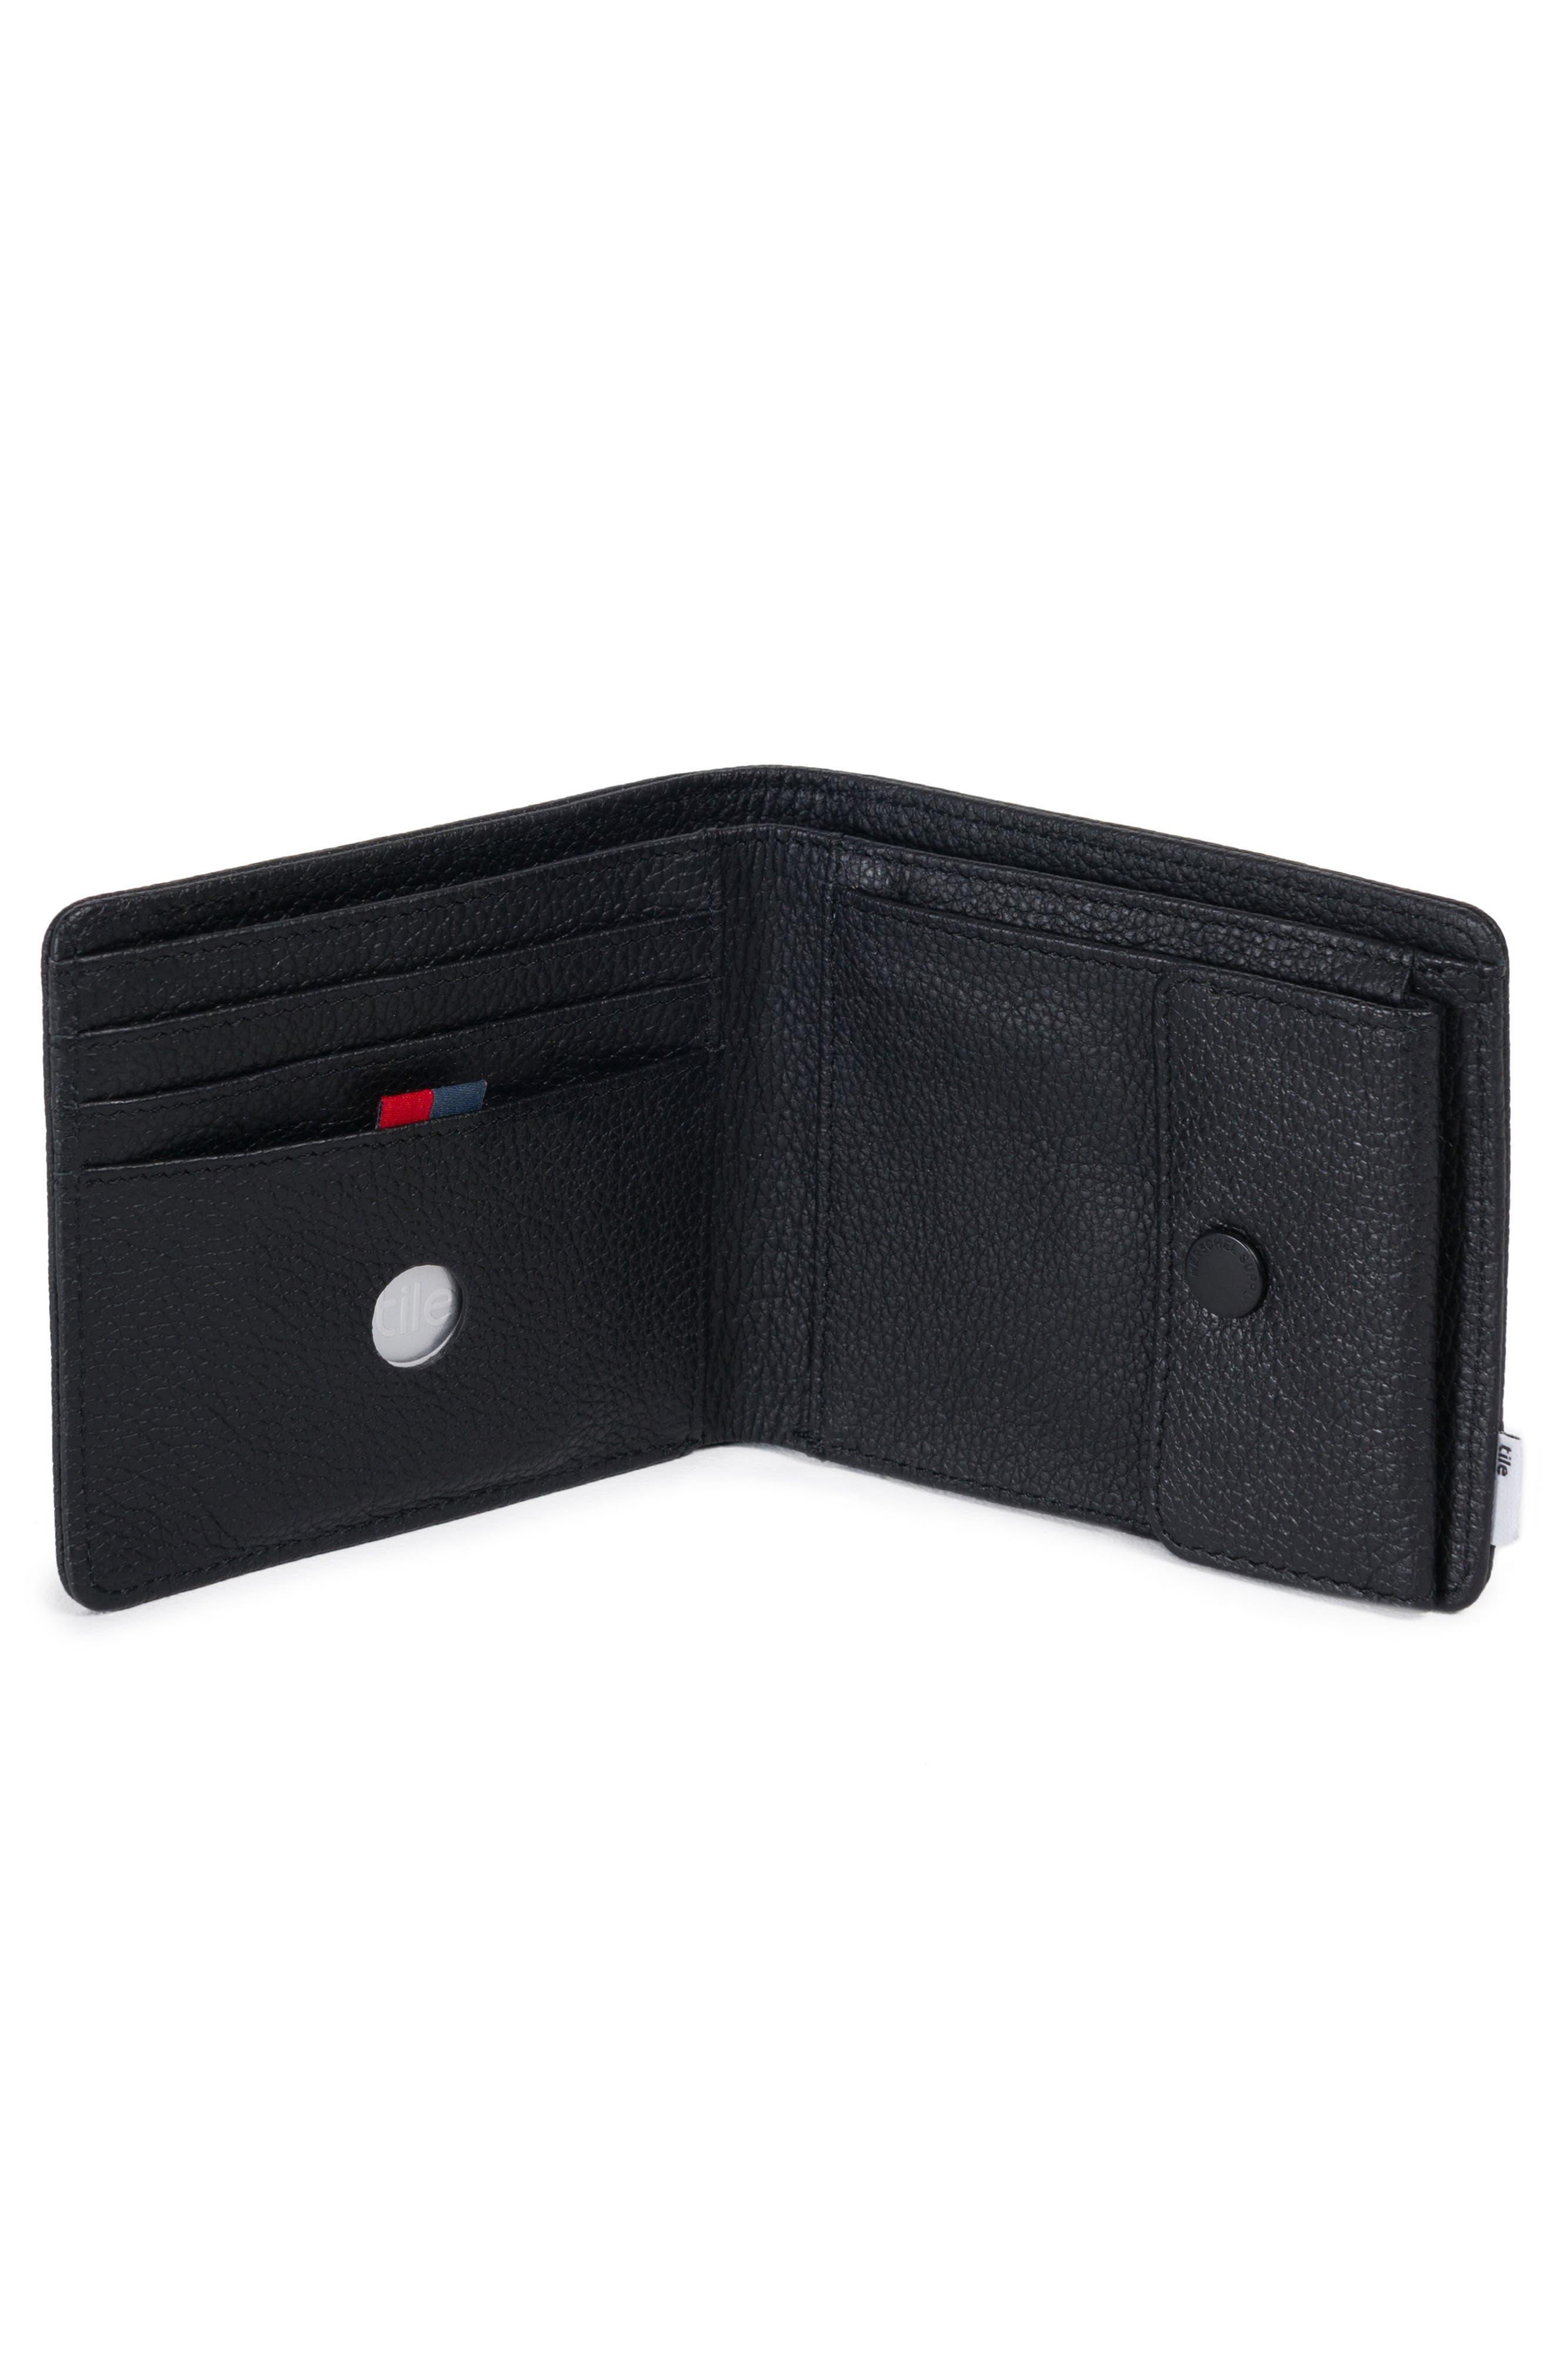 Tile Roy Leather Bifold Wallet,                             Alternate thumbnail 2, color,                             BLACK PEBBLED LEATHER